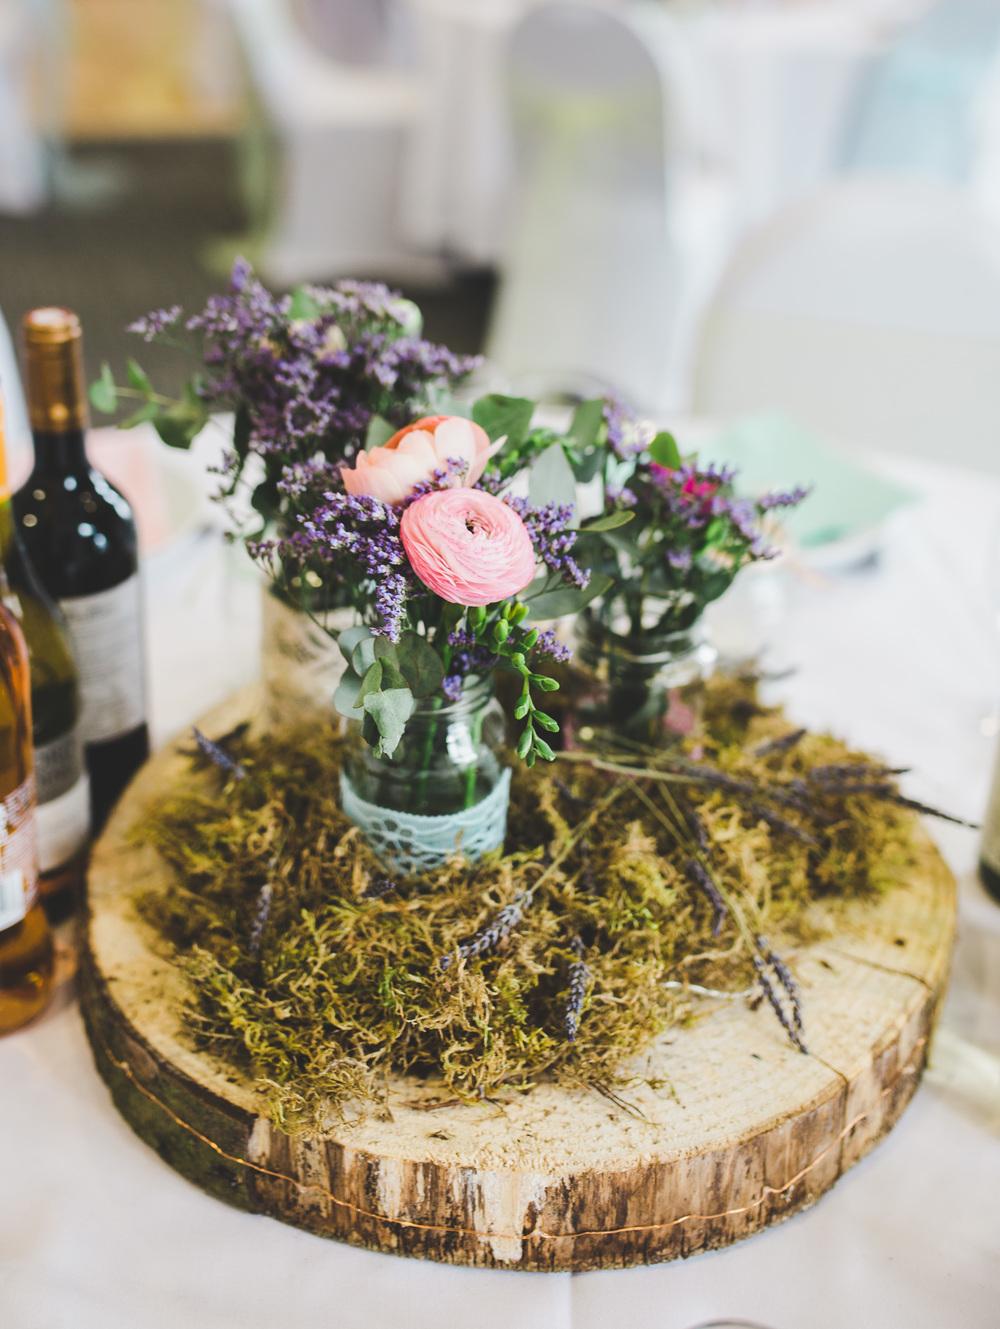 Cheshire wedding photographer - Marthall Hall Wedding (31).jpg